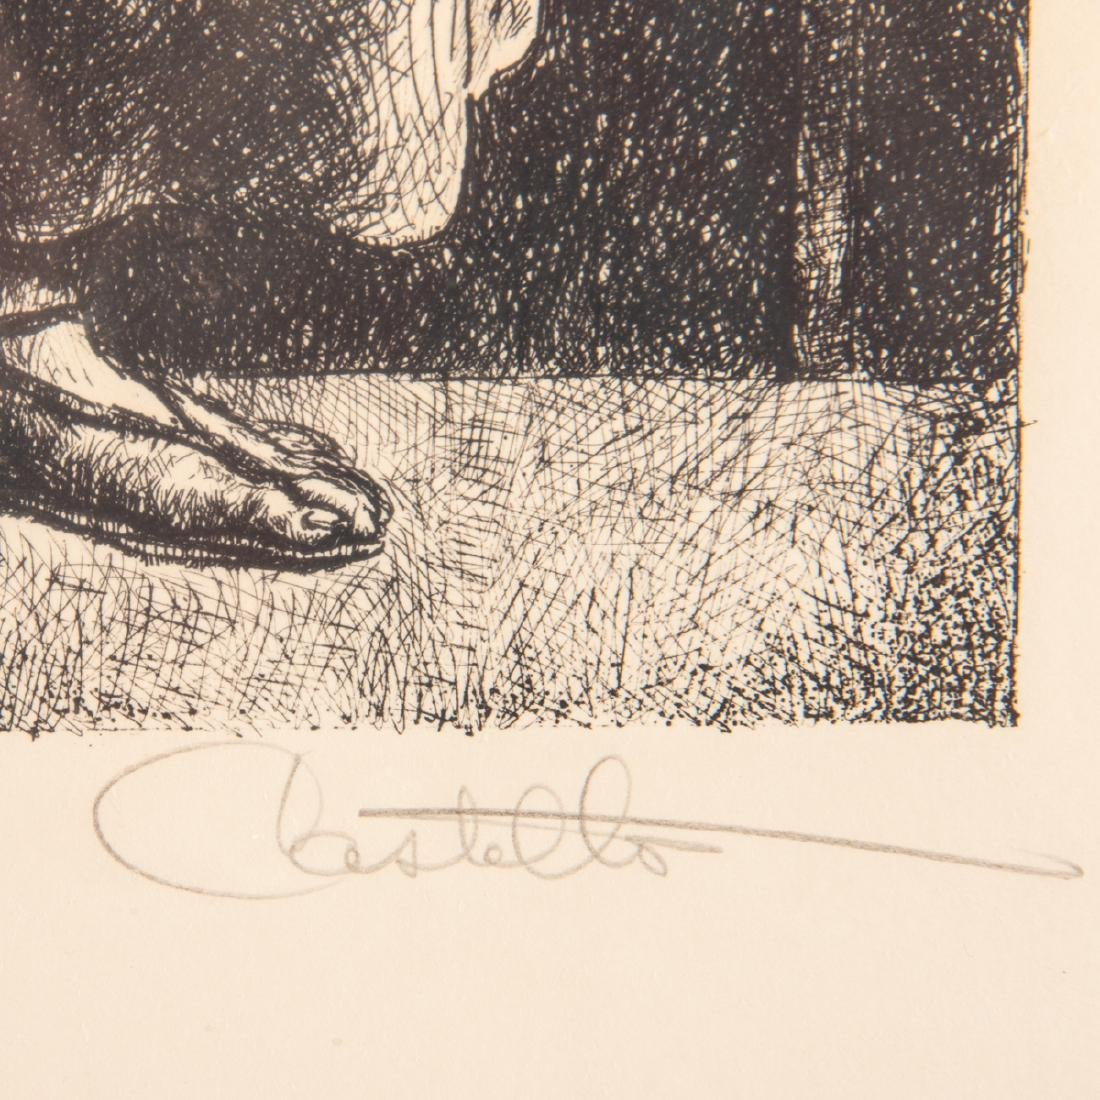 Federico Castellon (1914-1971) Hermes and Panacea, - 3